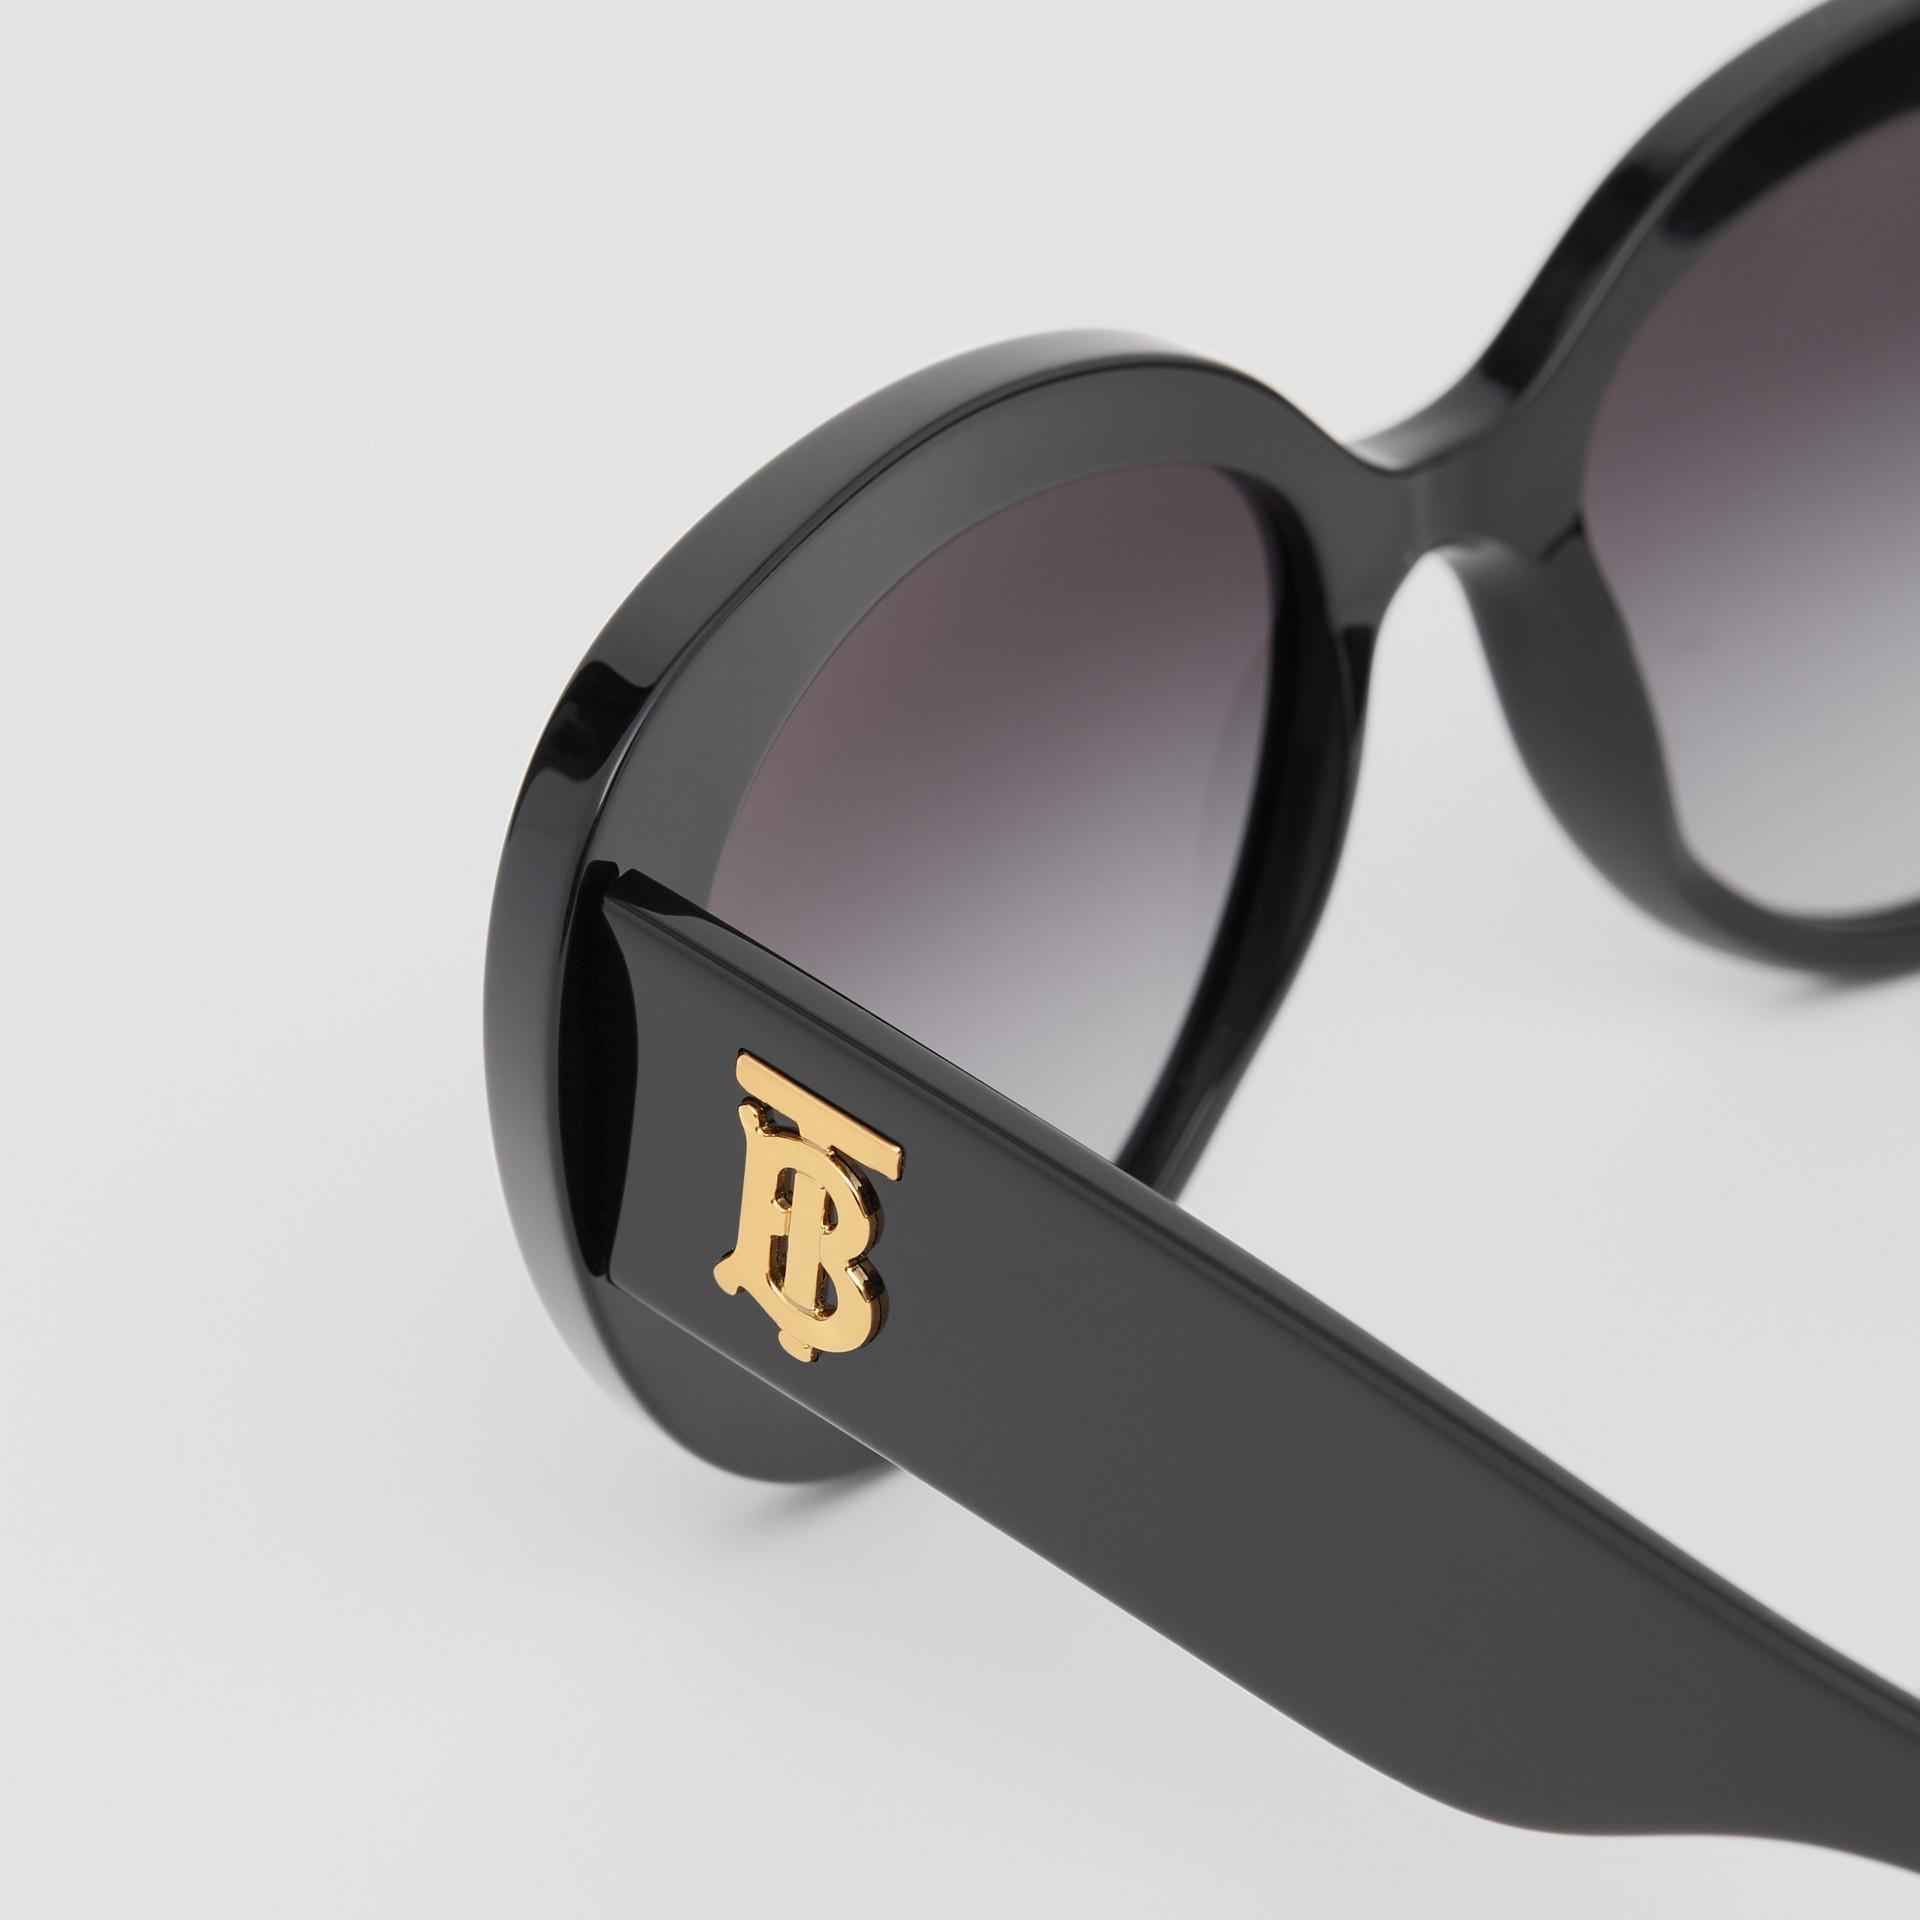 Monogram Motif Cat-eye Frame Sunglasses in Black - Women | Burberry - gallery image 1